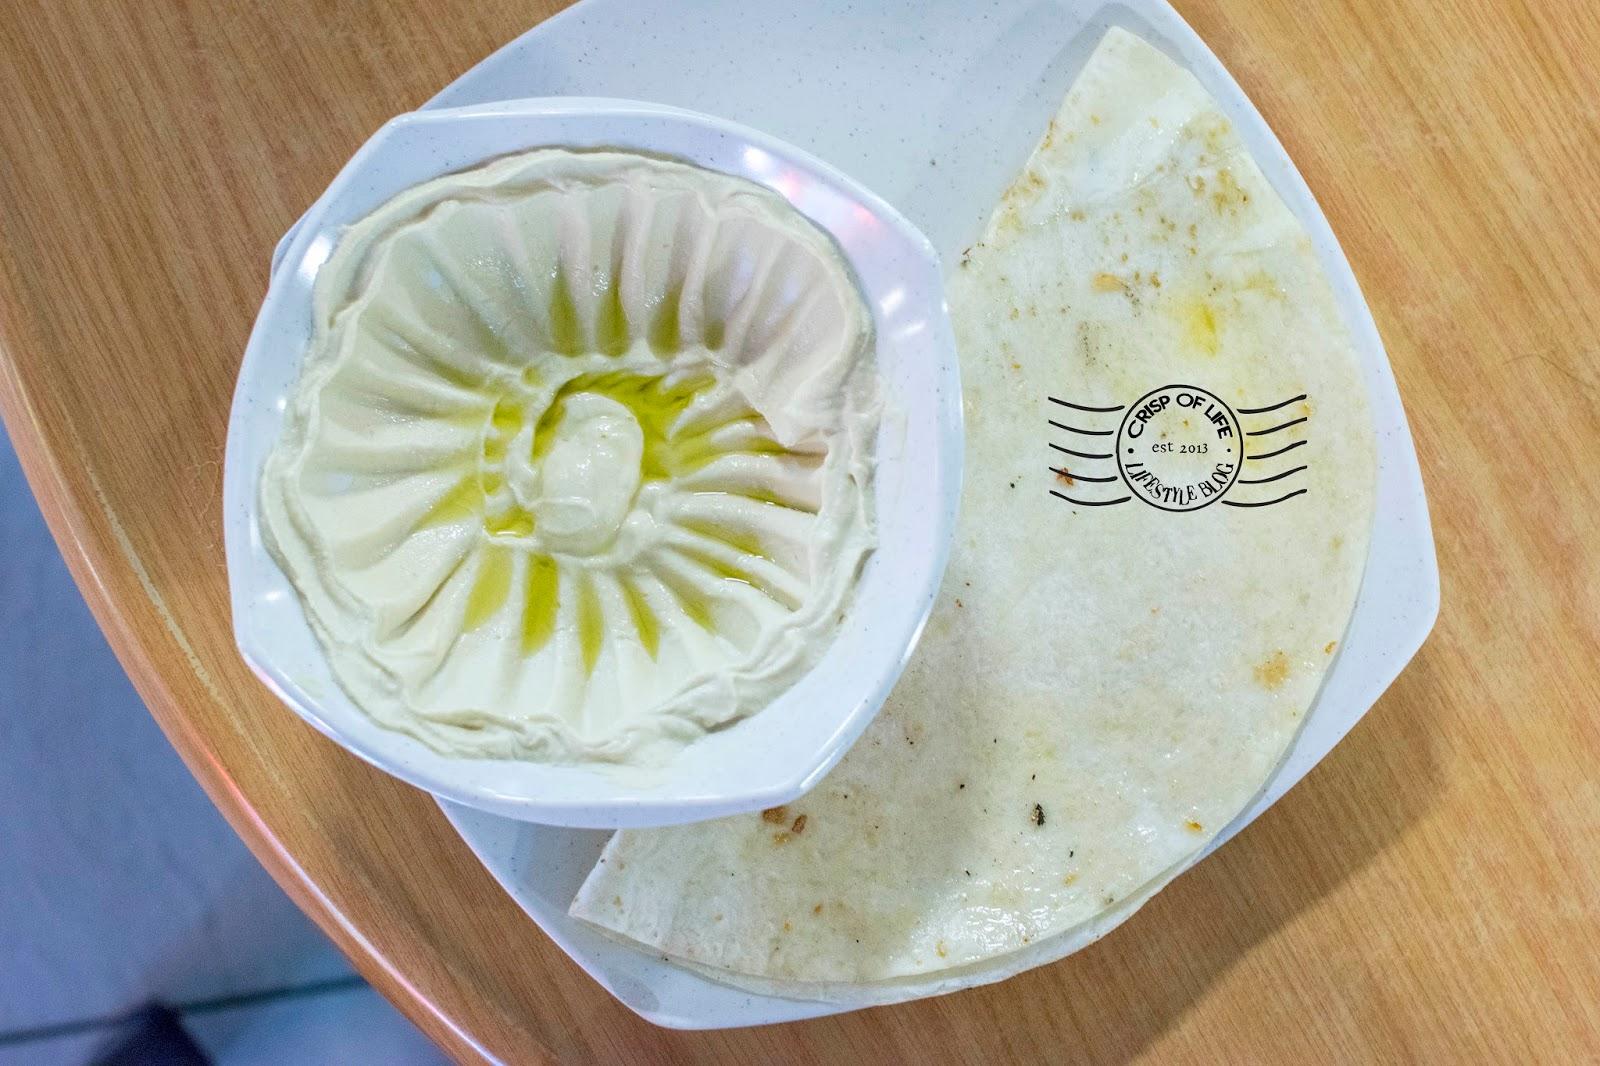 Mediterranean Levantine Cuisine Lucky Eatery Relau